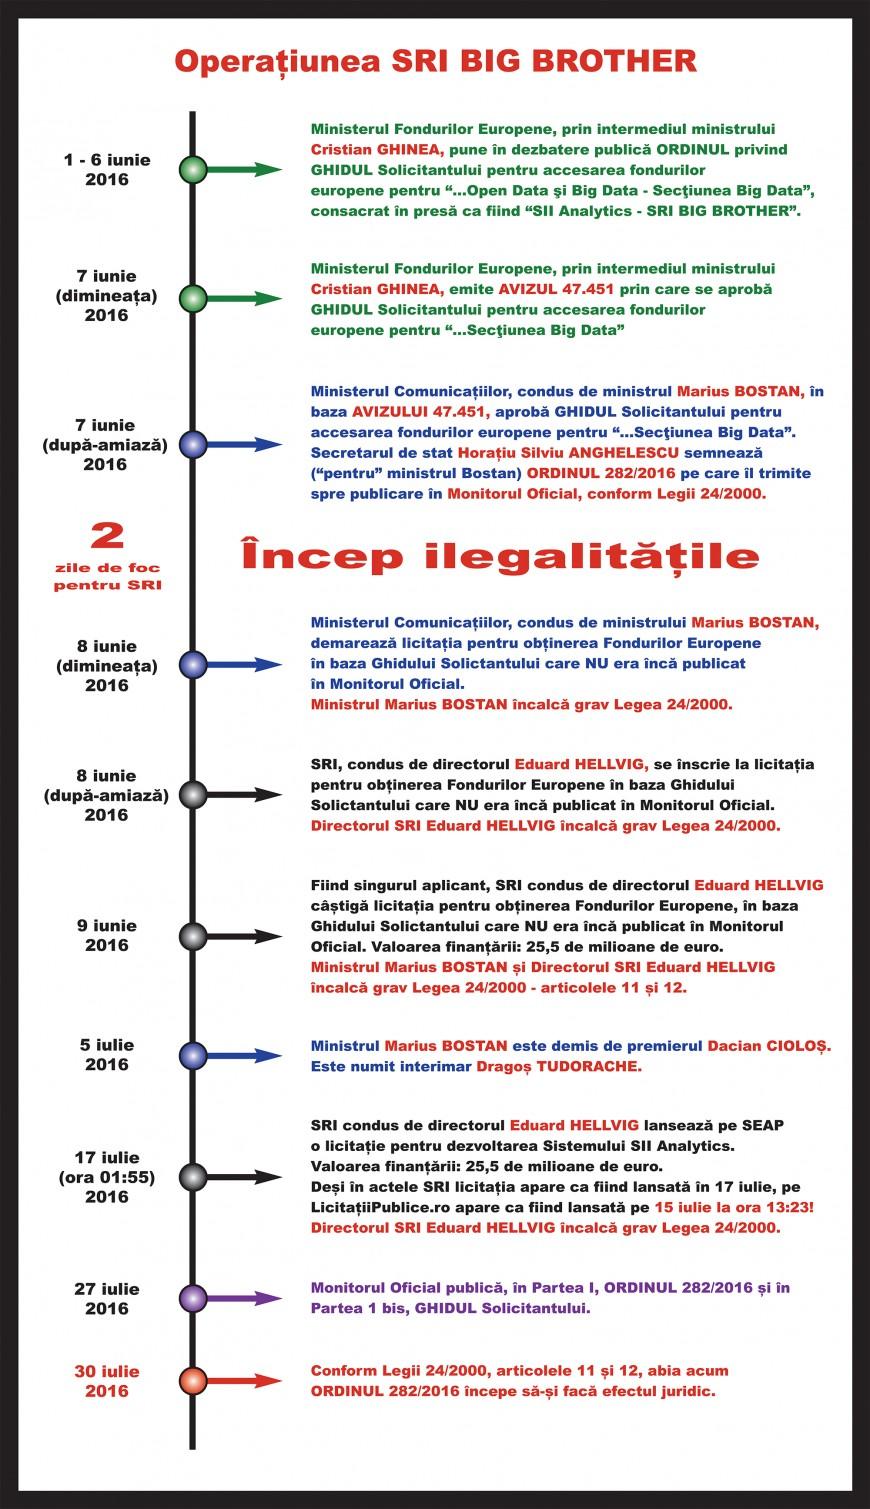 1-Schema-SRI-incalca-Legea-24